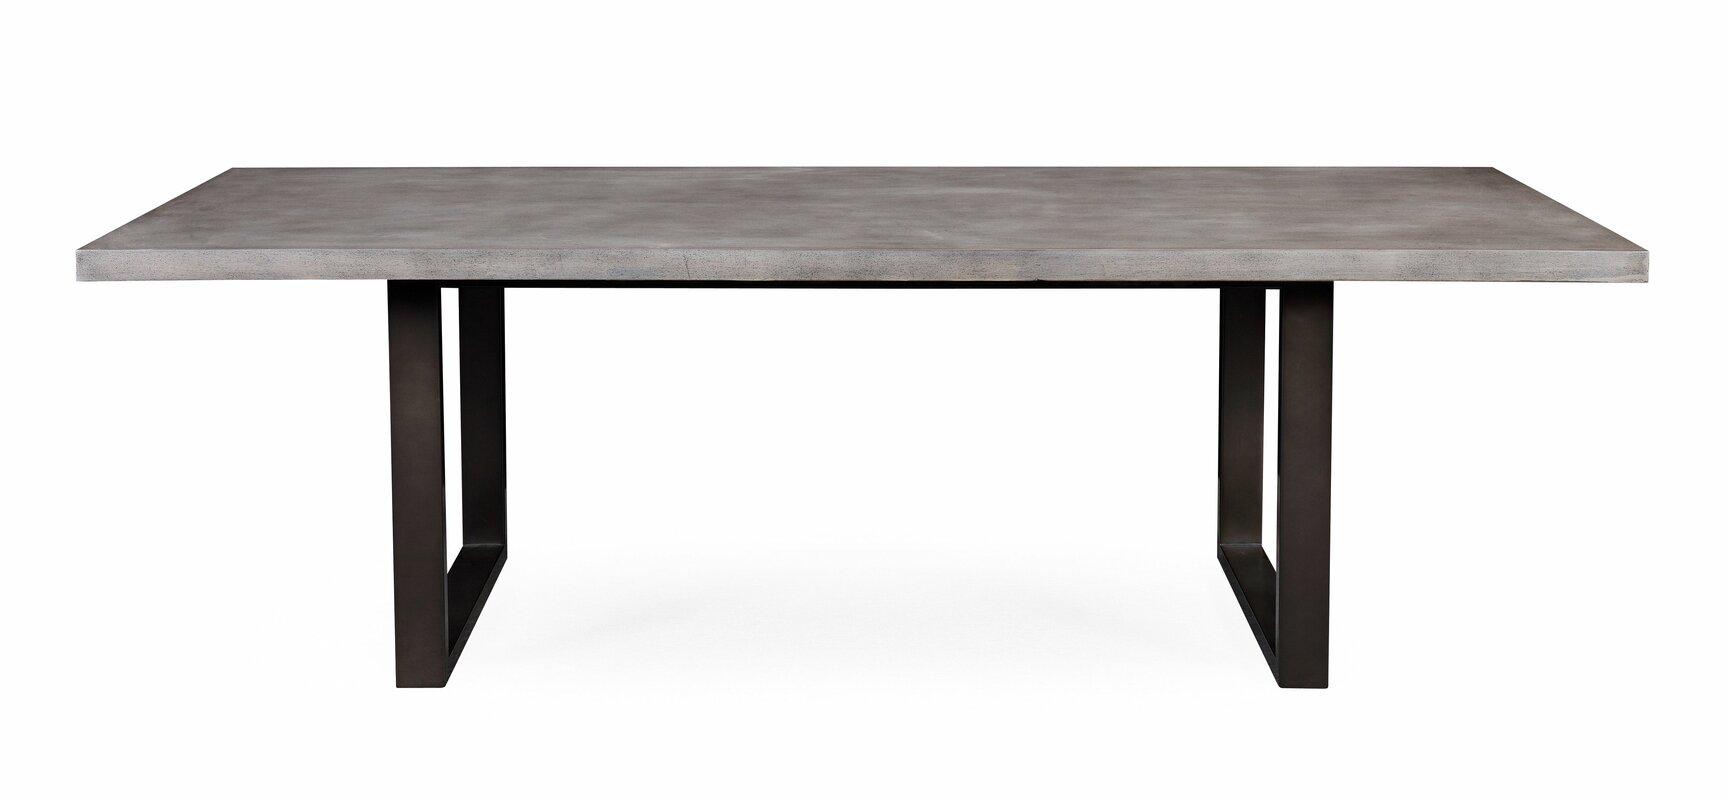 Superior Carnarvon Concrete Dining Table